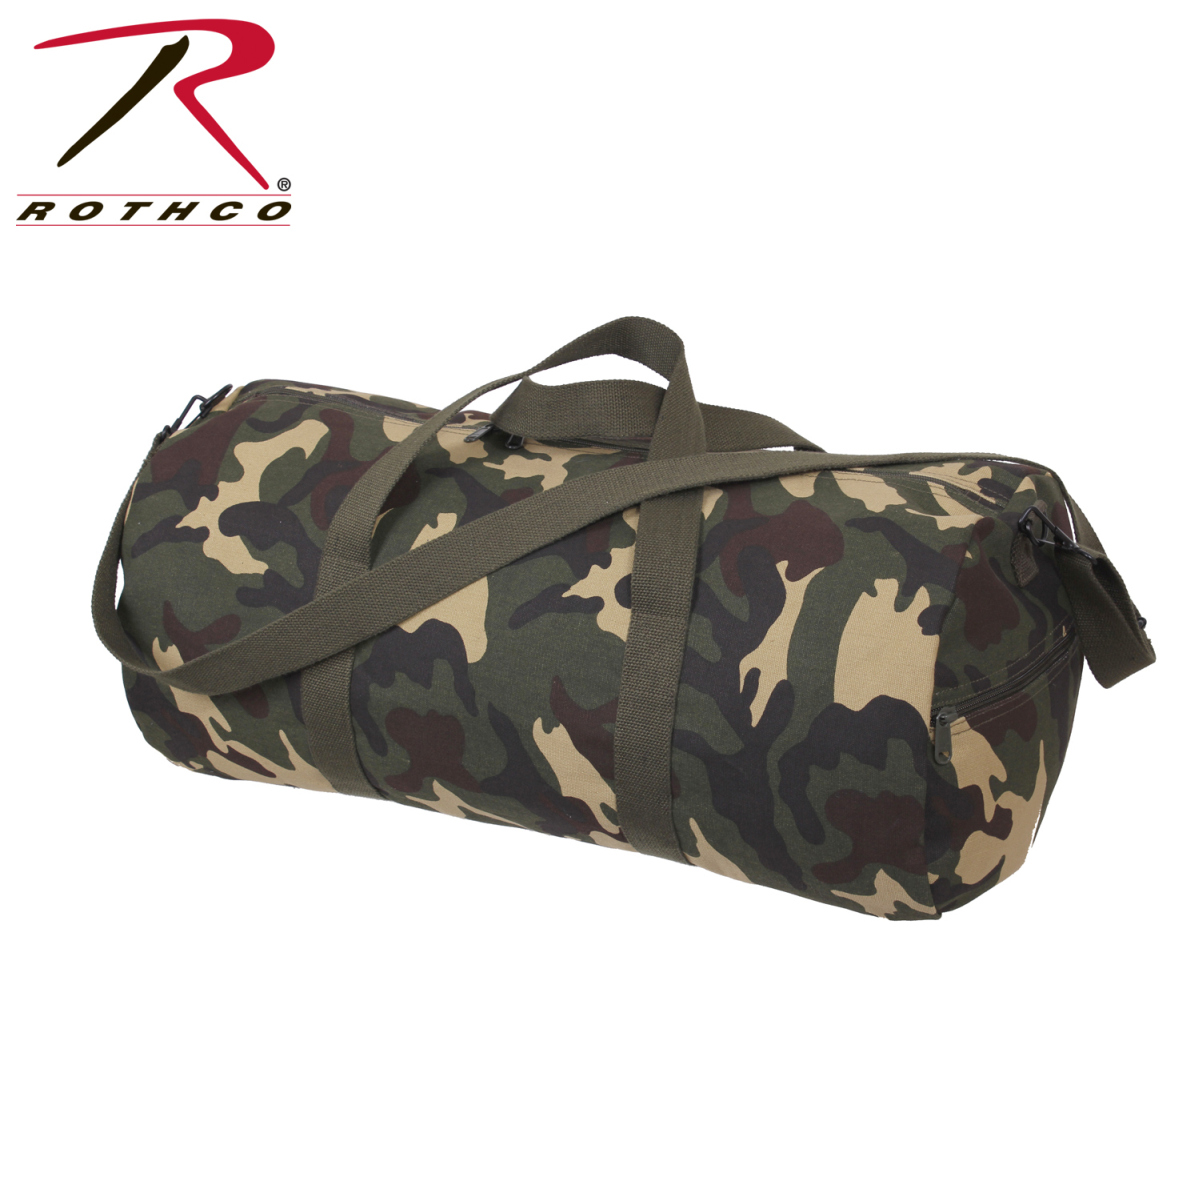 f1c5951b0a5 Buy Rothco Canvas Shoulder Duffle Bag - 24 Inch - Rothco Online at ...